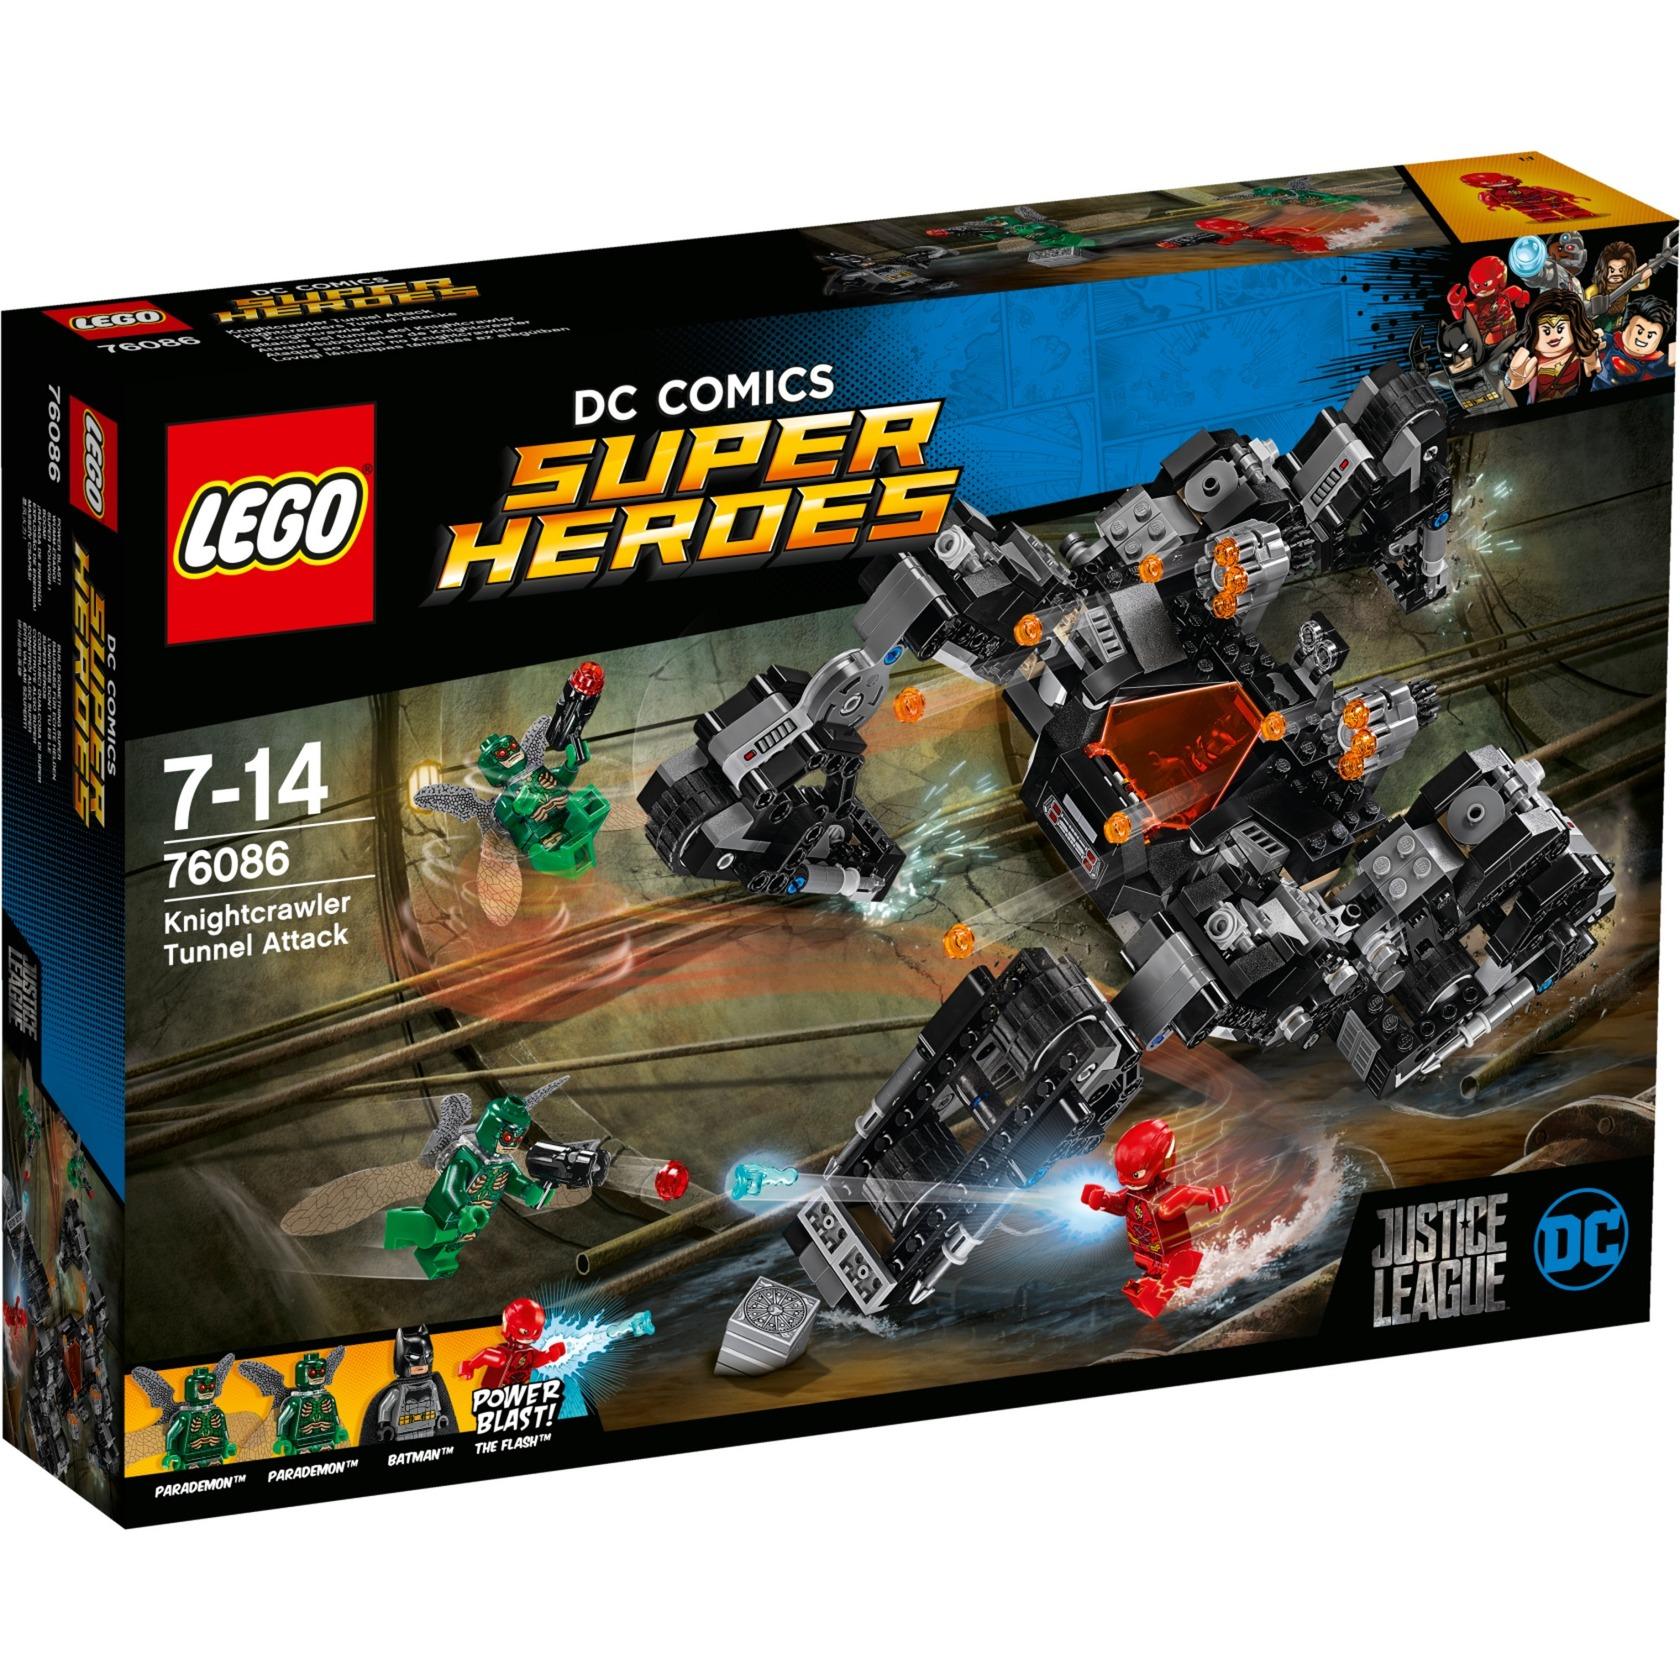 LEGO DC Comics Super Heroes - Le Knightcrawler, Jouets de construction